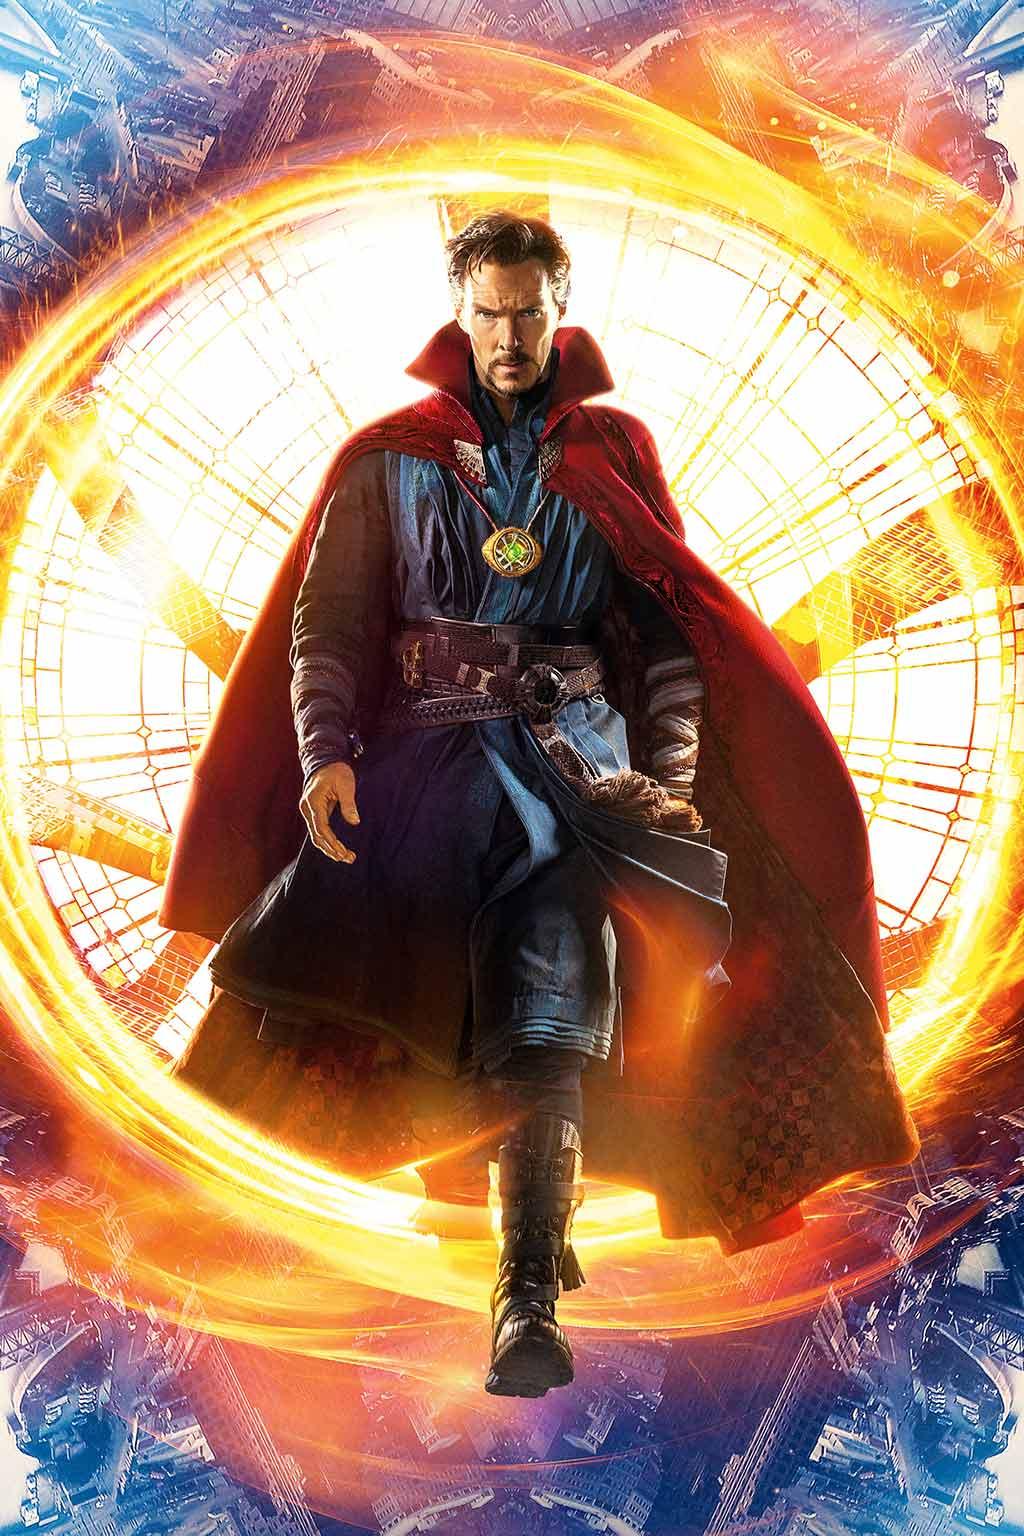 فیلمبرداری Doctor Strange in the Multiverse Of Madness